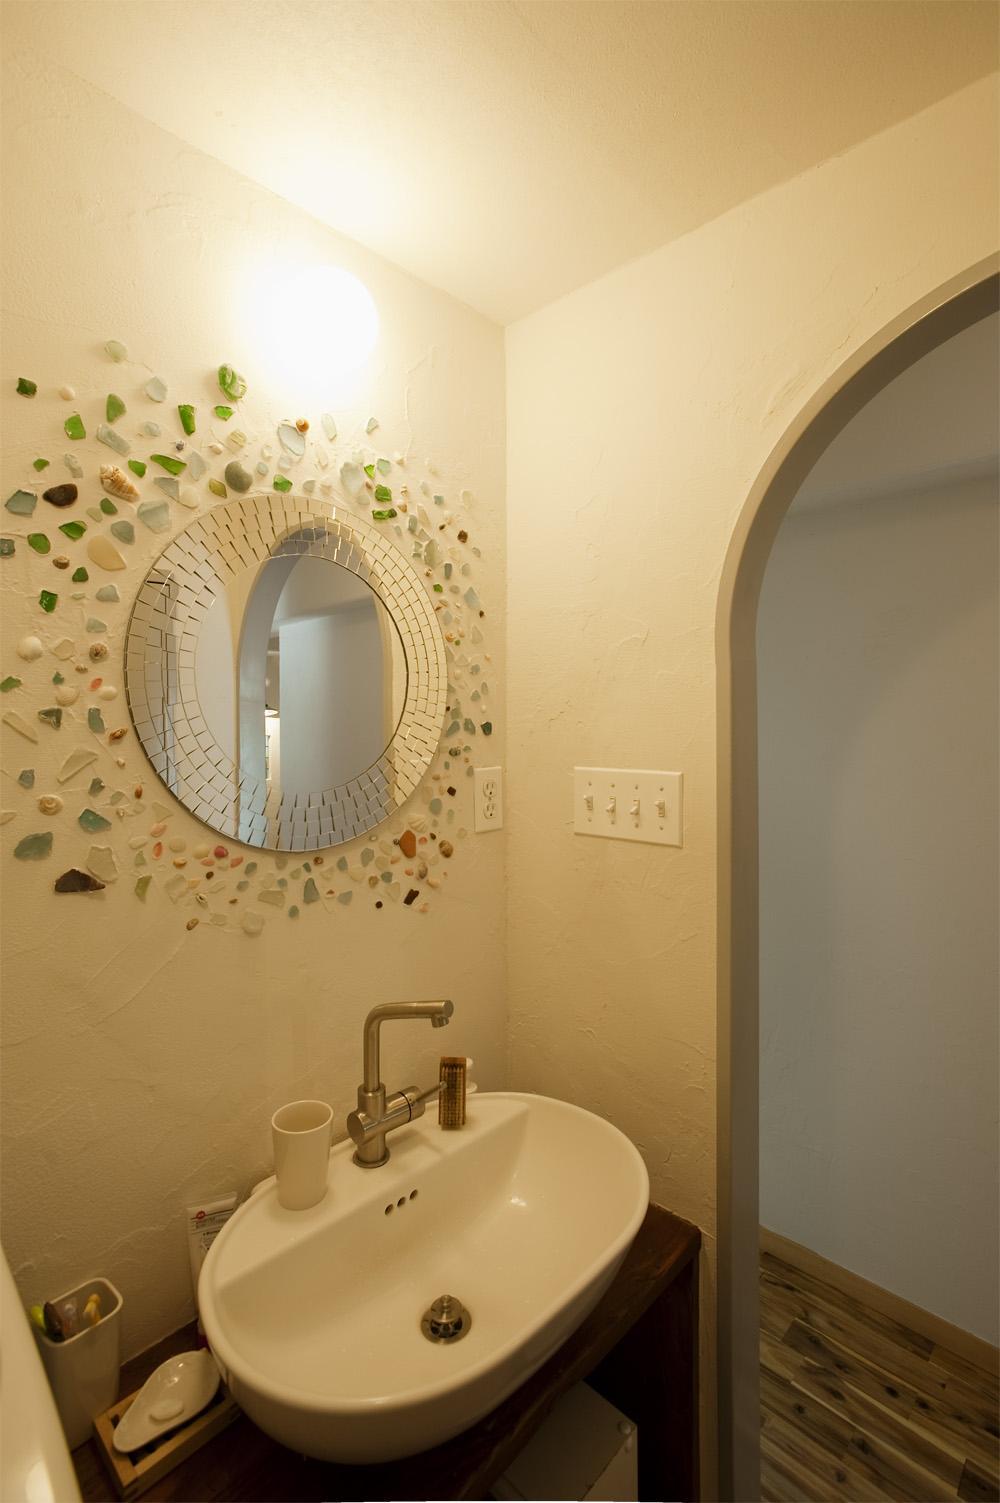 H邸・ハンモックのゆれる、光と風のリビングの部屋 丸鏡と貝殻がアクセントの洗面所